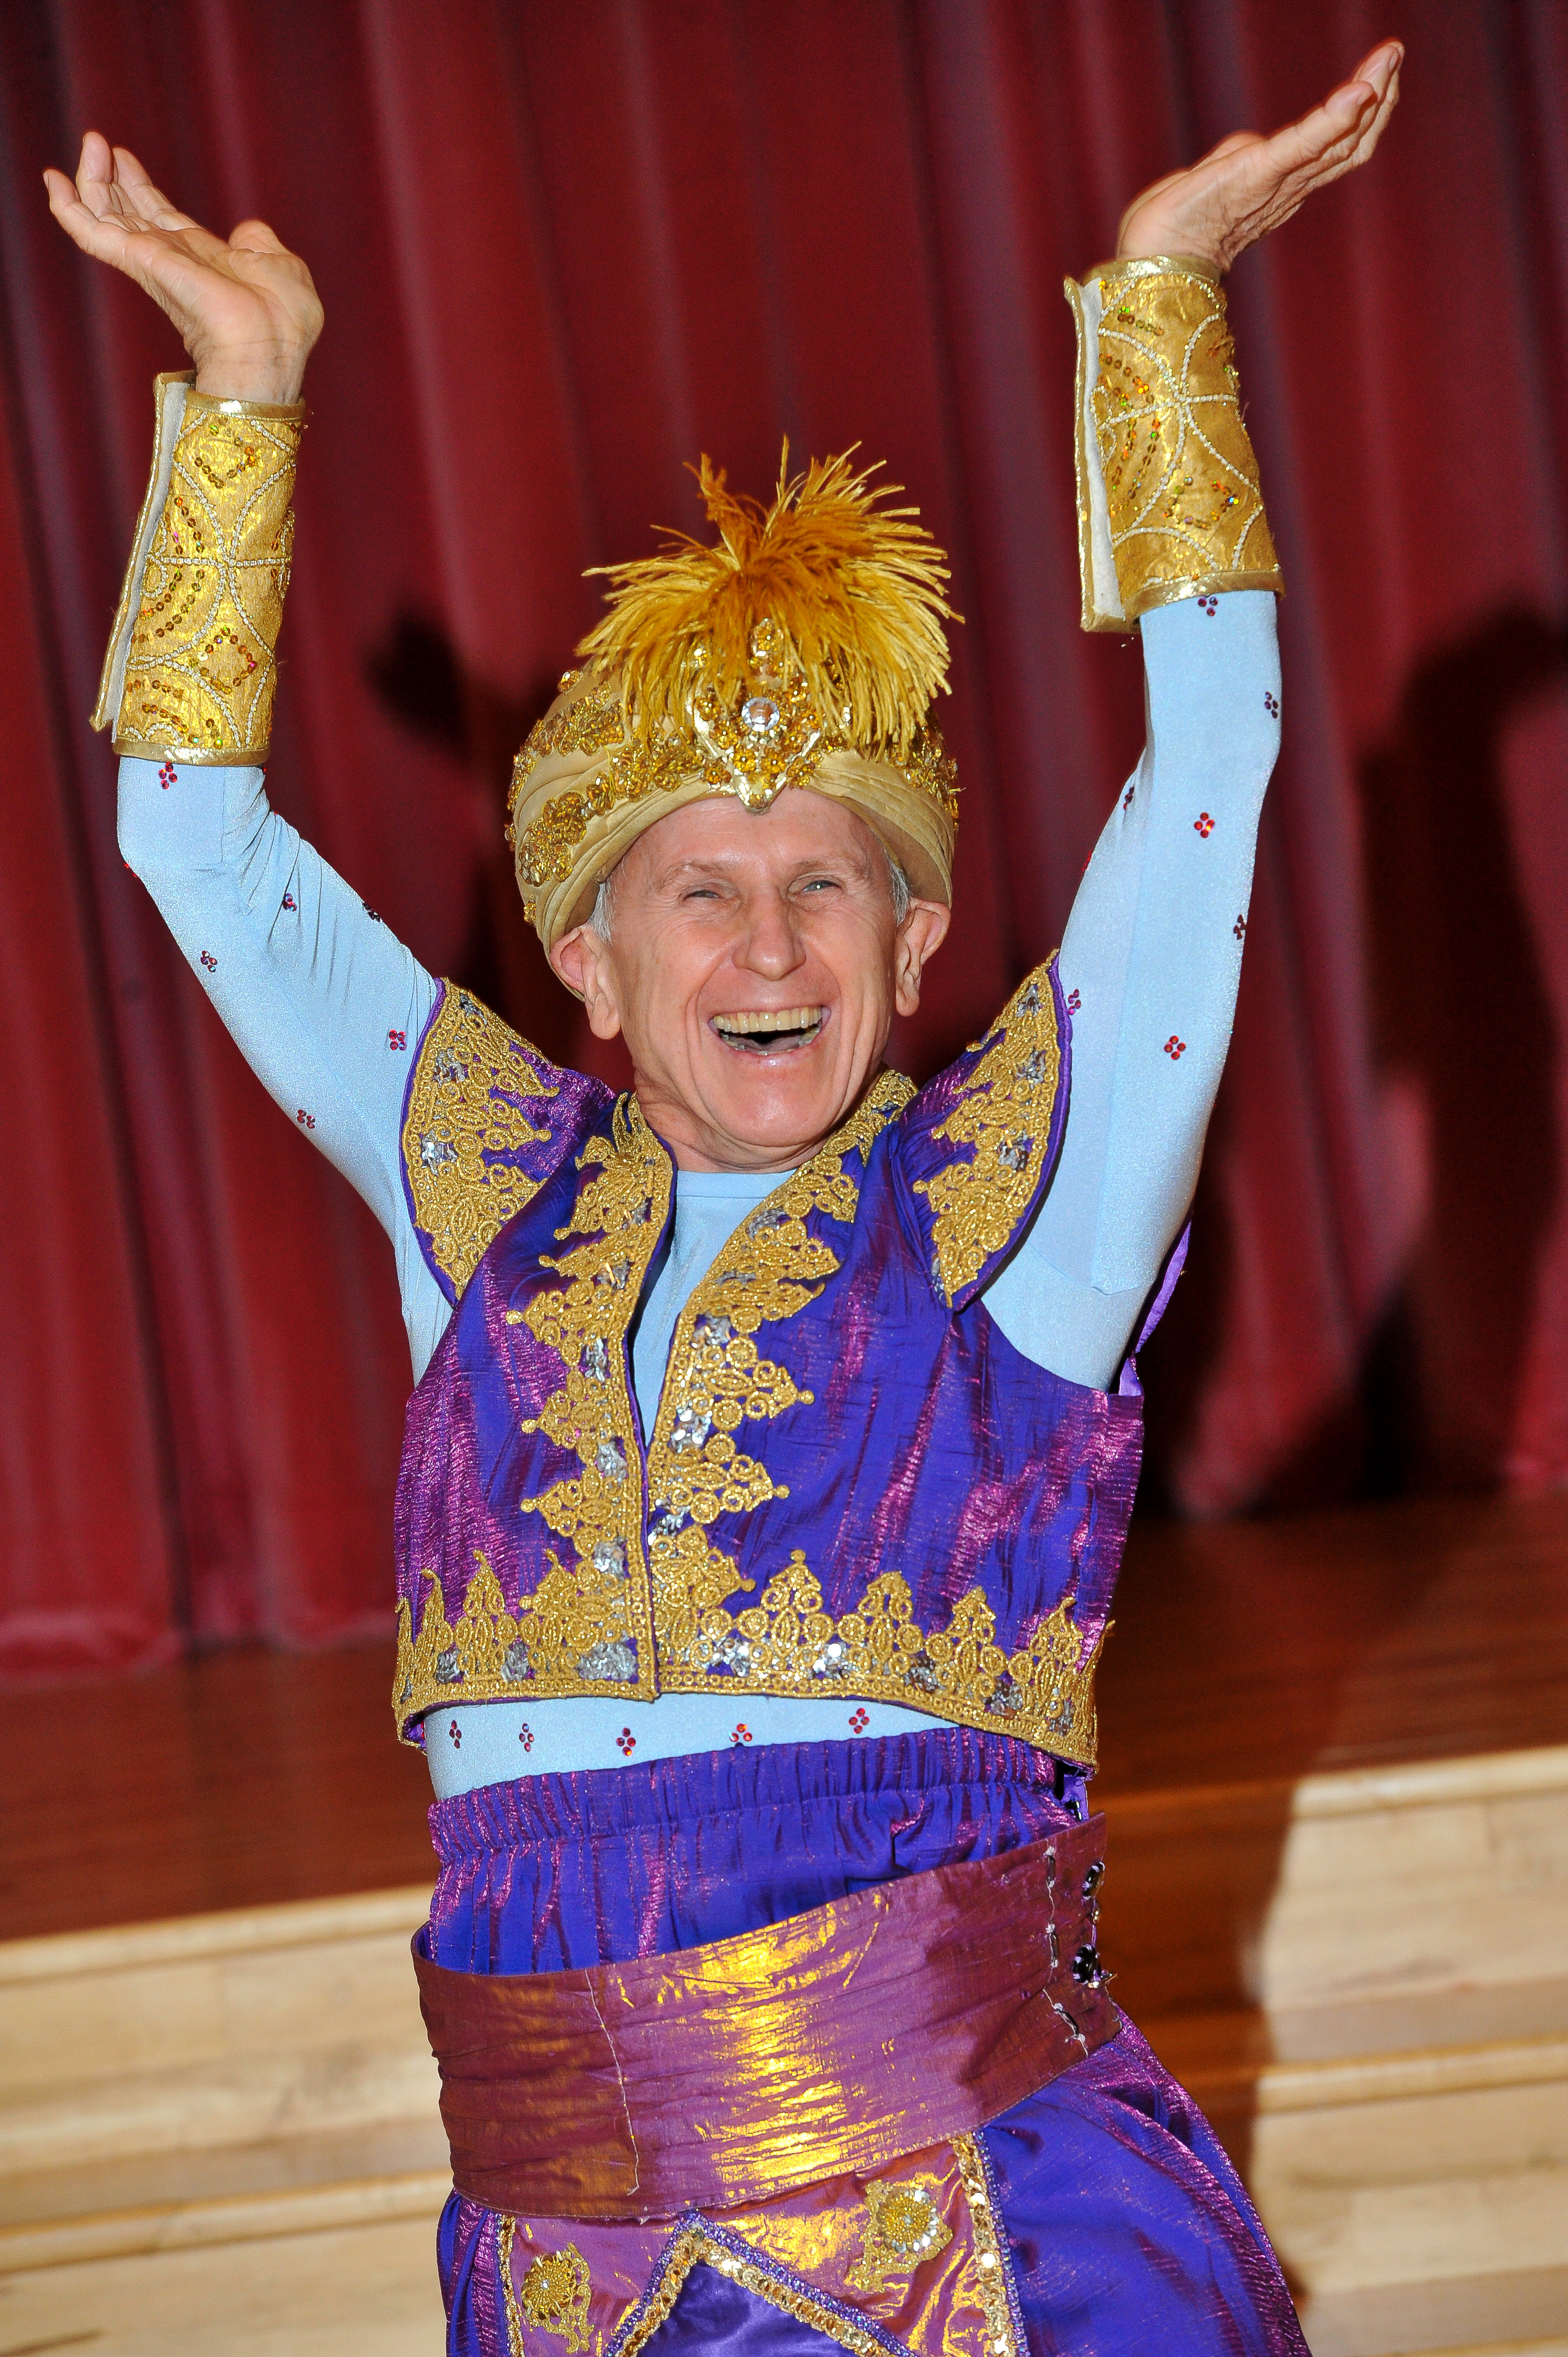 Wayne Sleep. Aladdin, Milton Keynes Theatre pantomime Christmas 2015. Wayne Sleep as Genie of the Ring.